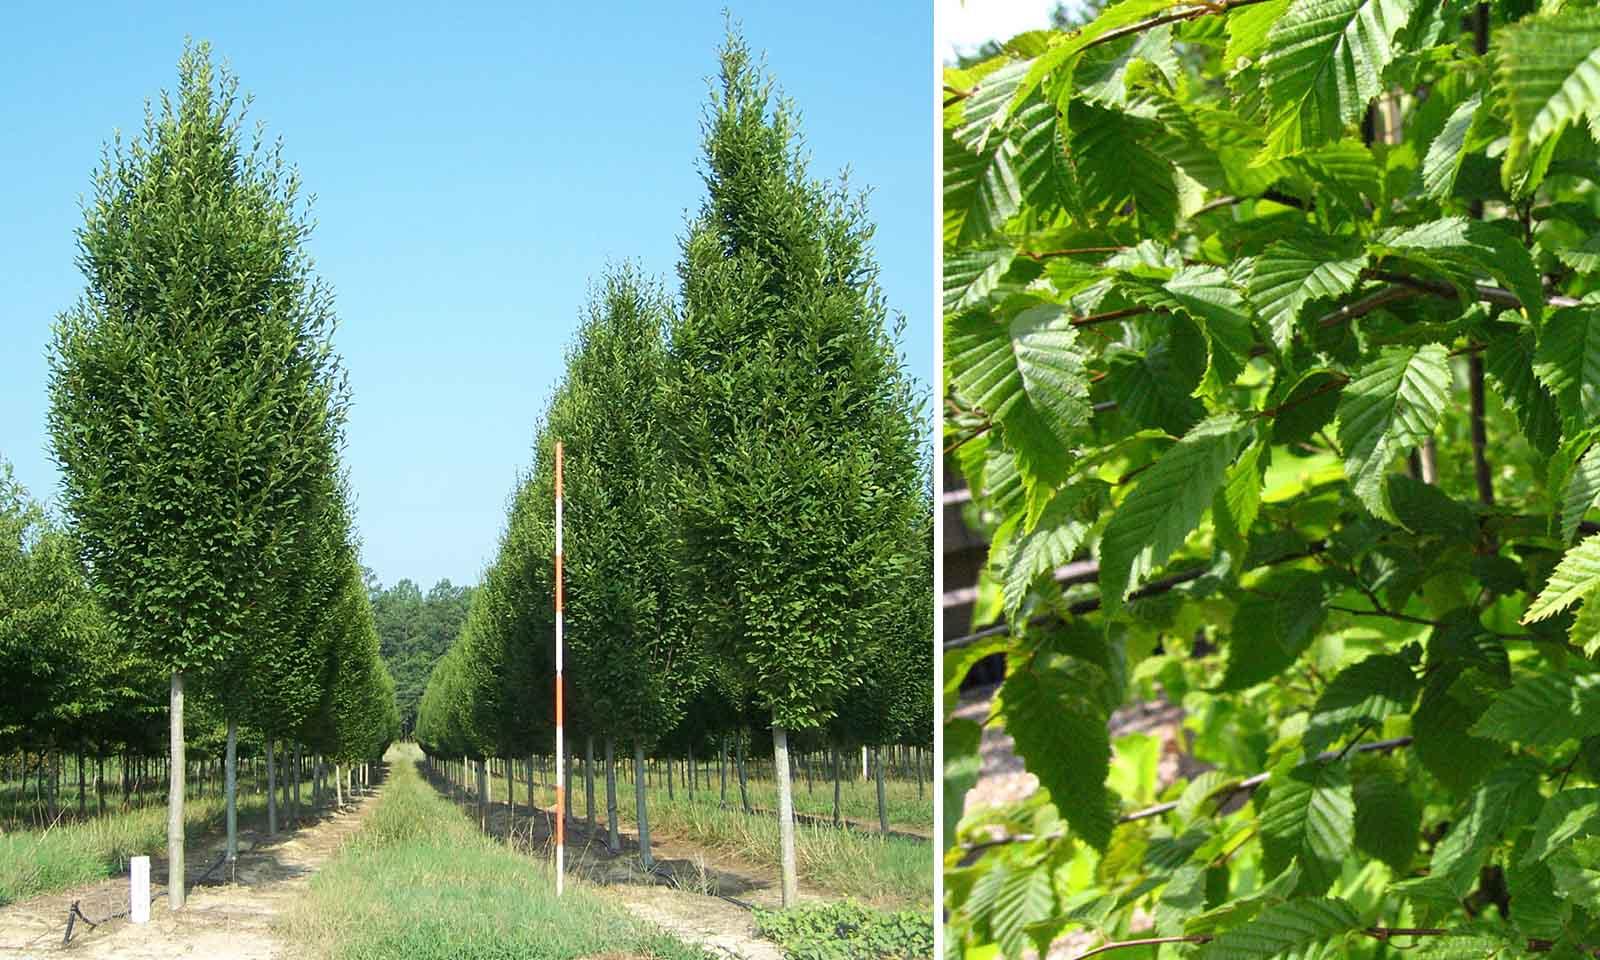 Carpinus Betulus (Hornbeam) - Standard